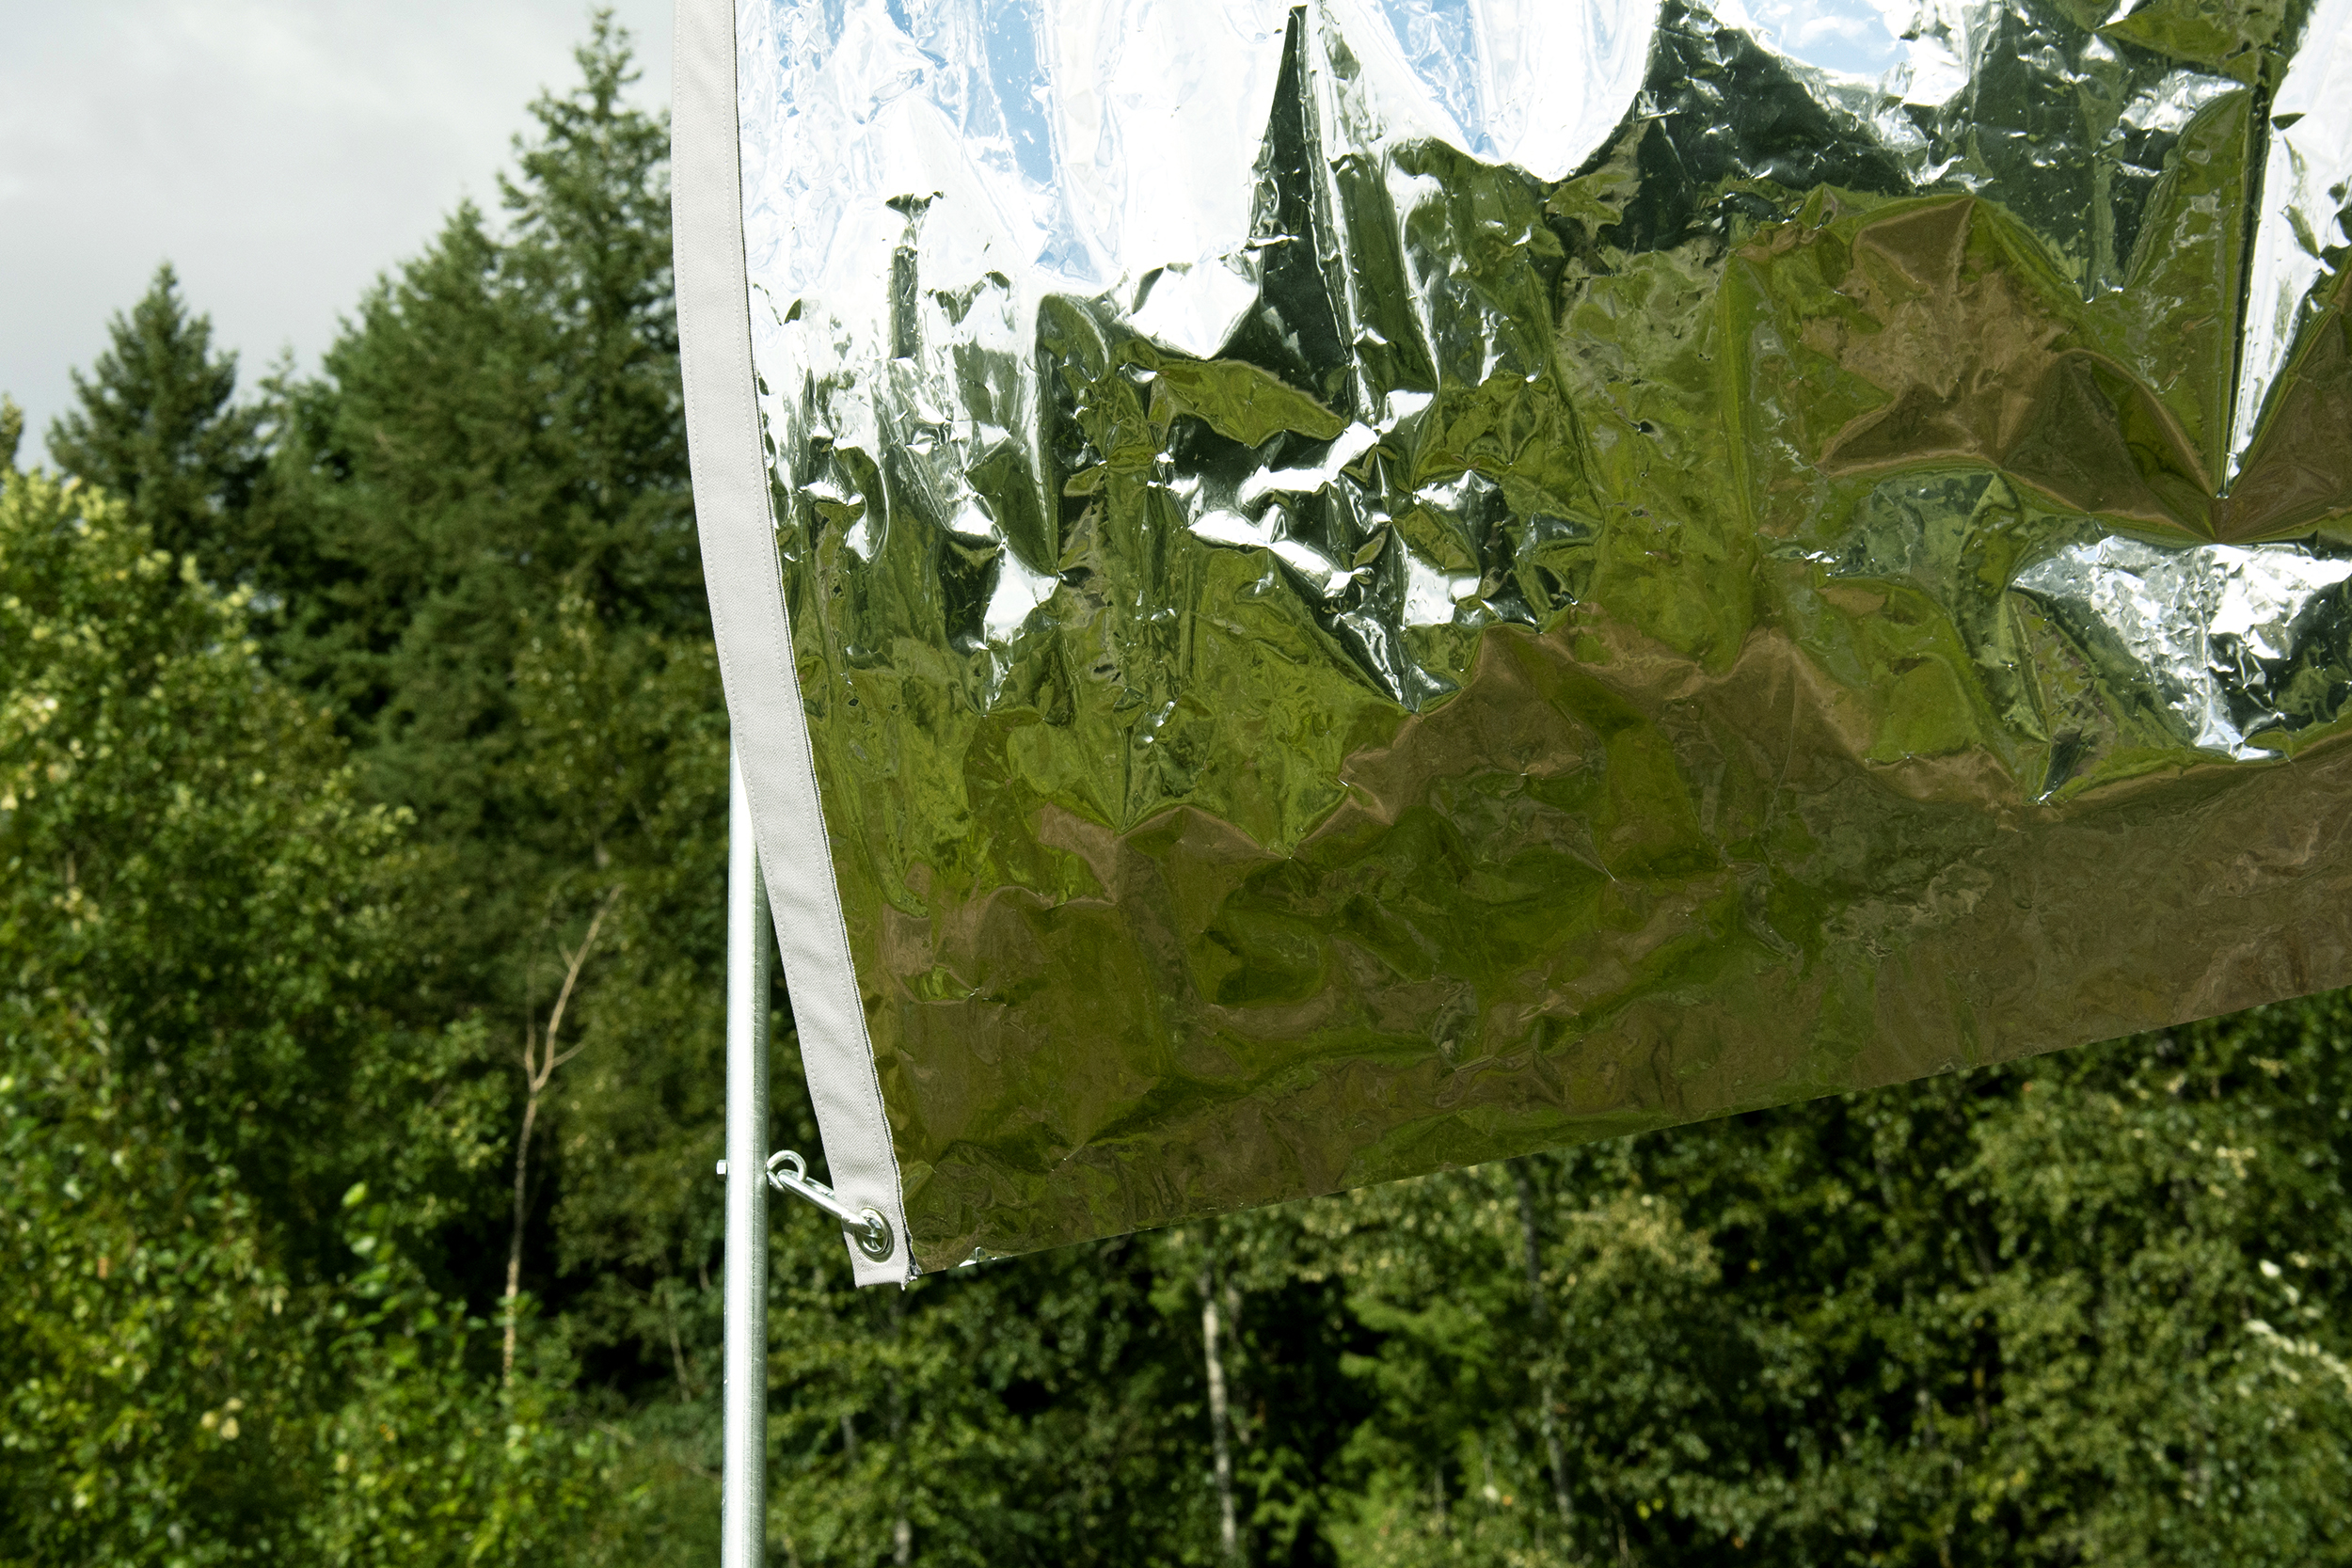 180822_MERCURY Flags_Latimer_0024_M.jpg